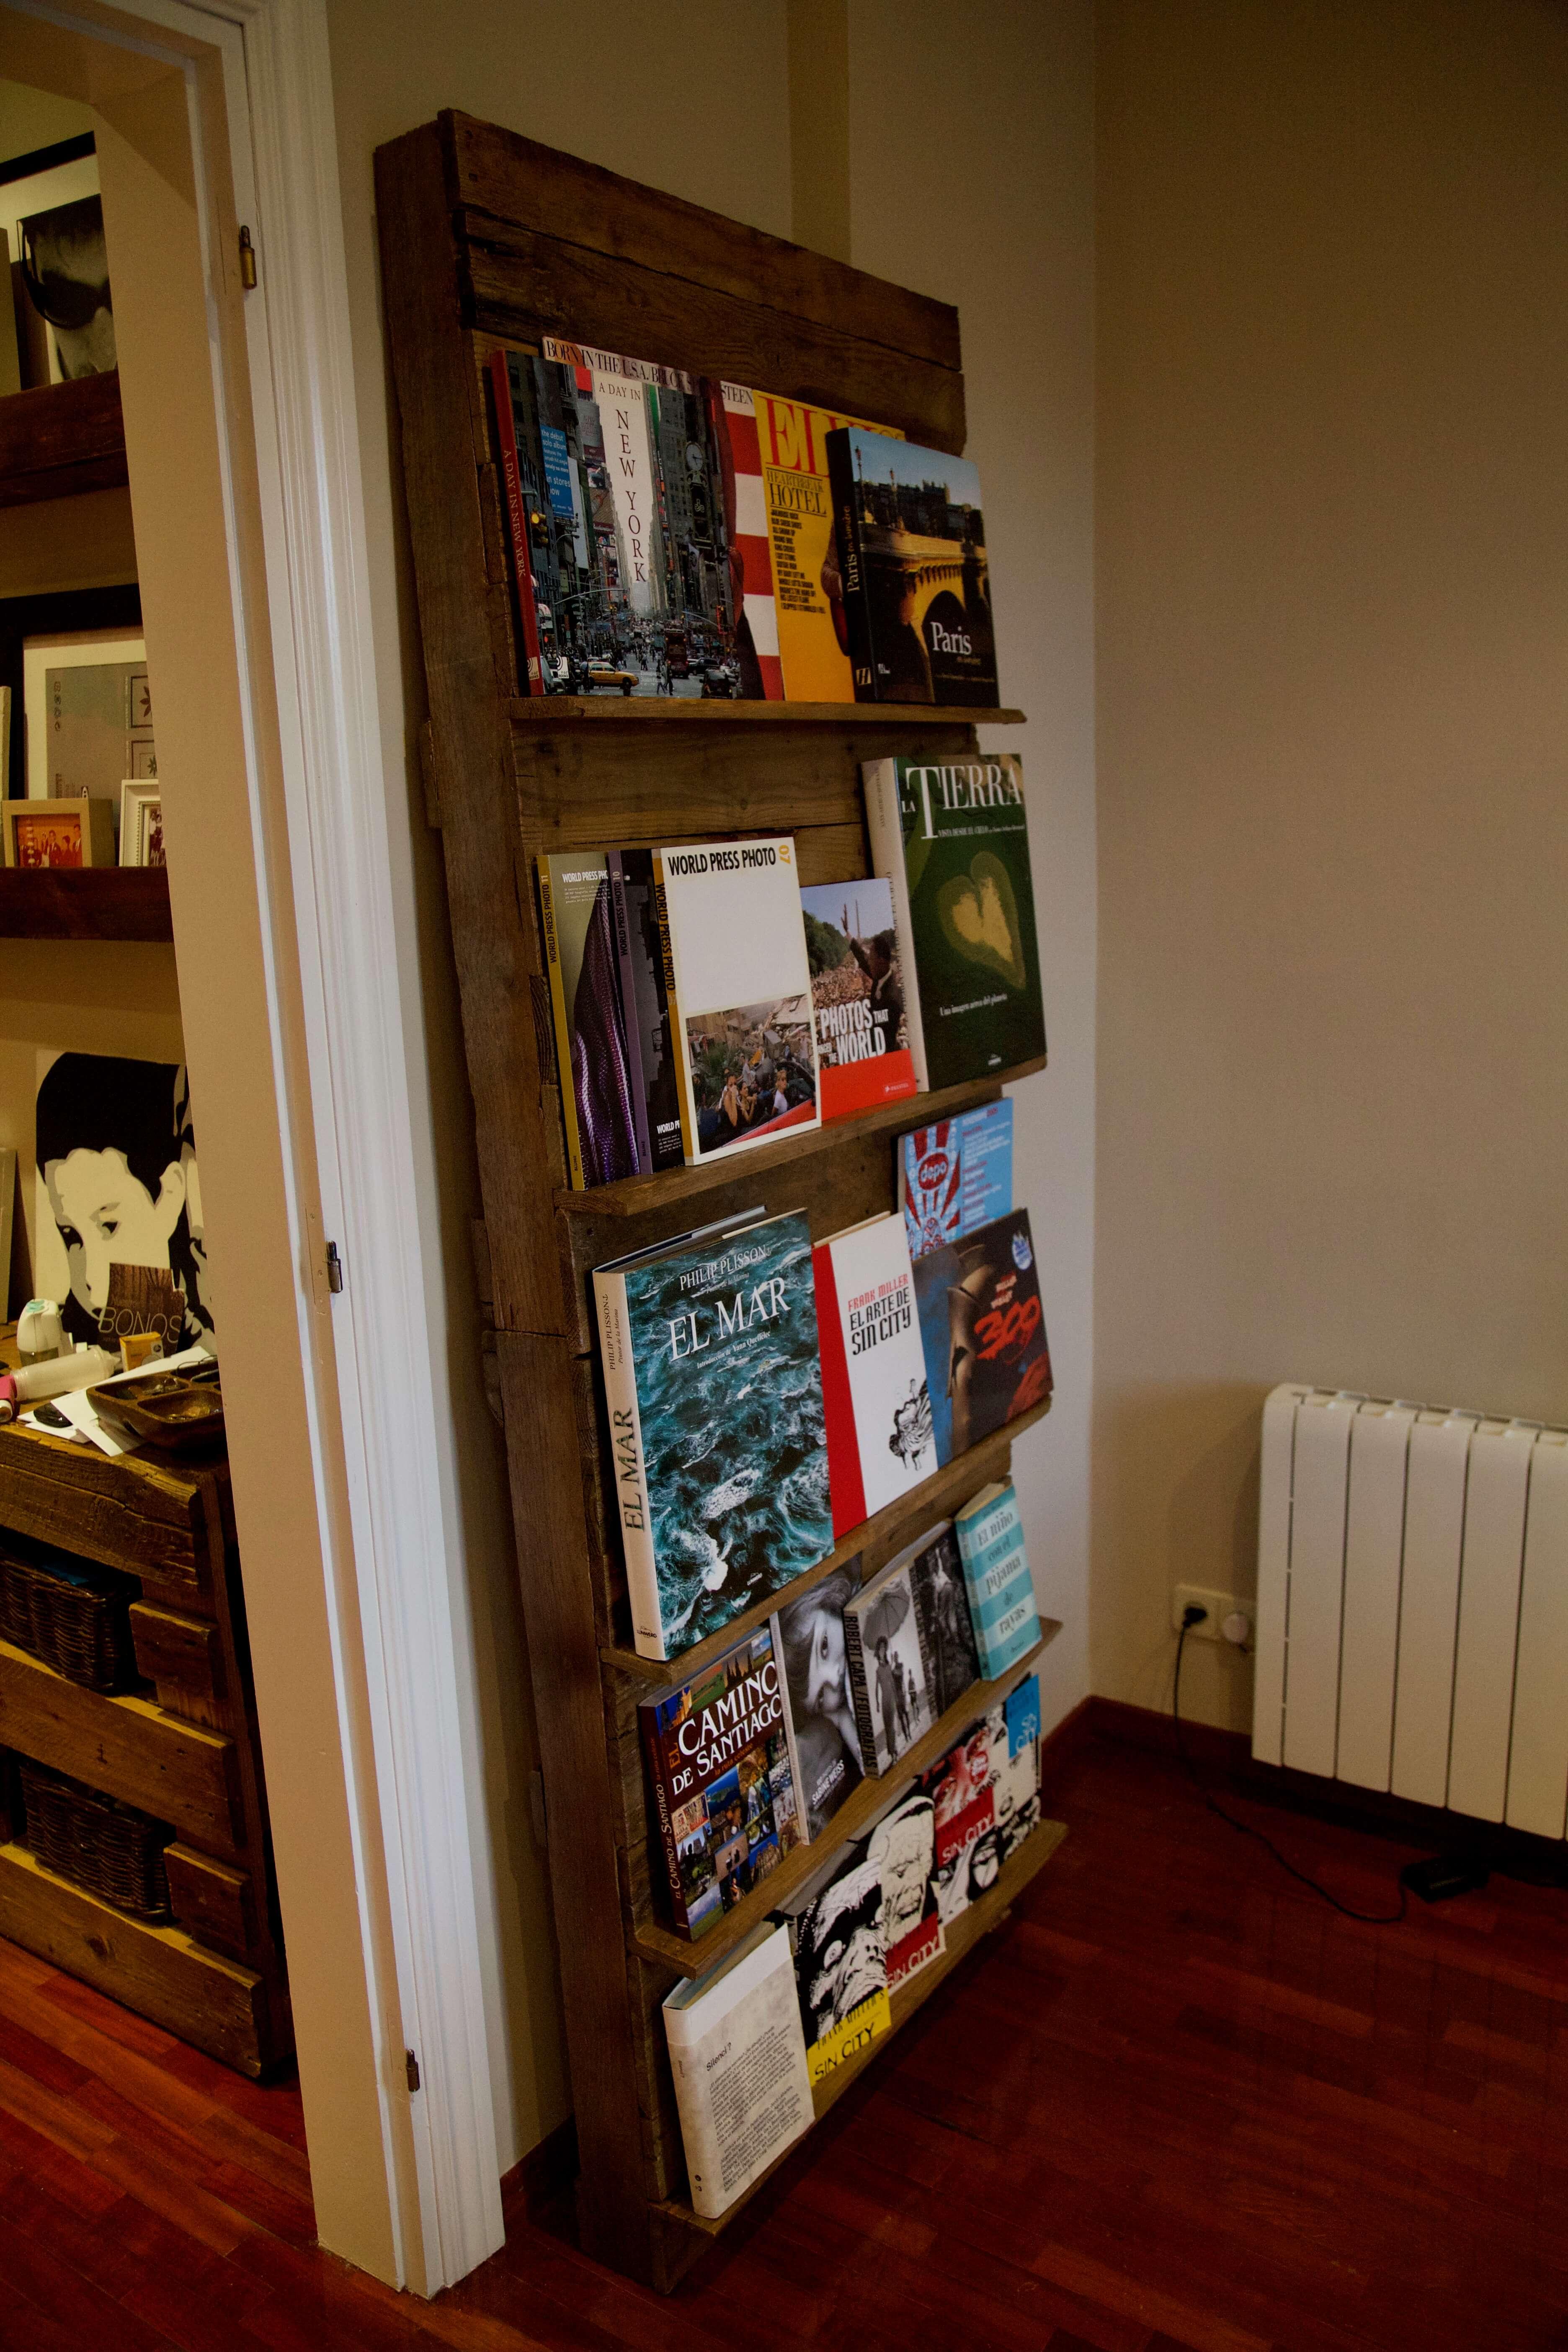 detalle lateral de la libreria expositor hecha con palets